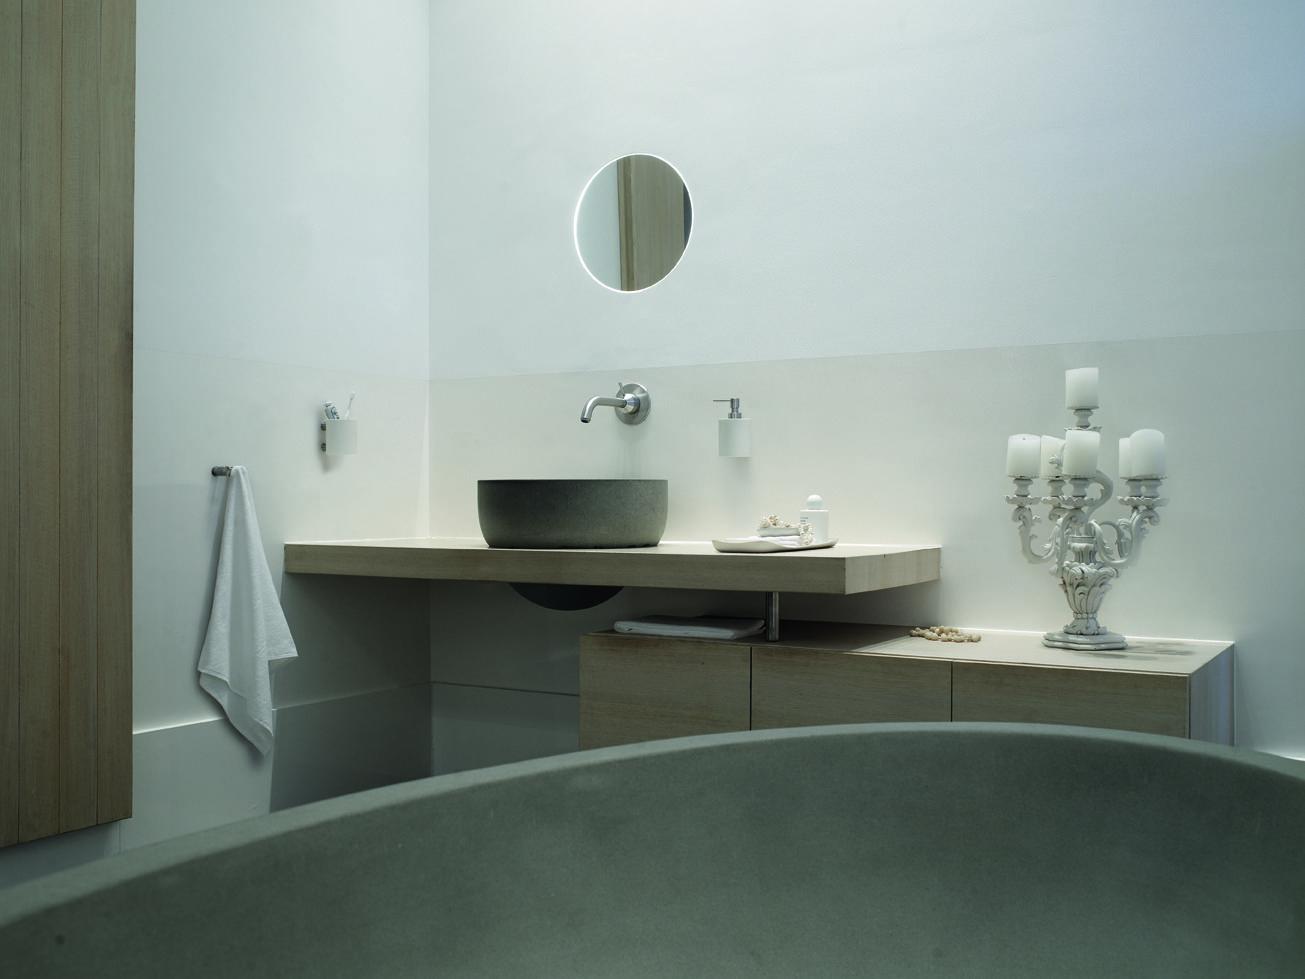 Piet Boon Styling by Karin Meyn   Bathware, Piet Boon by Formani.